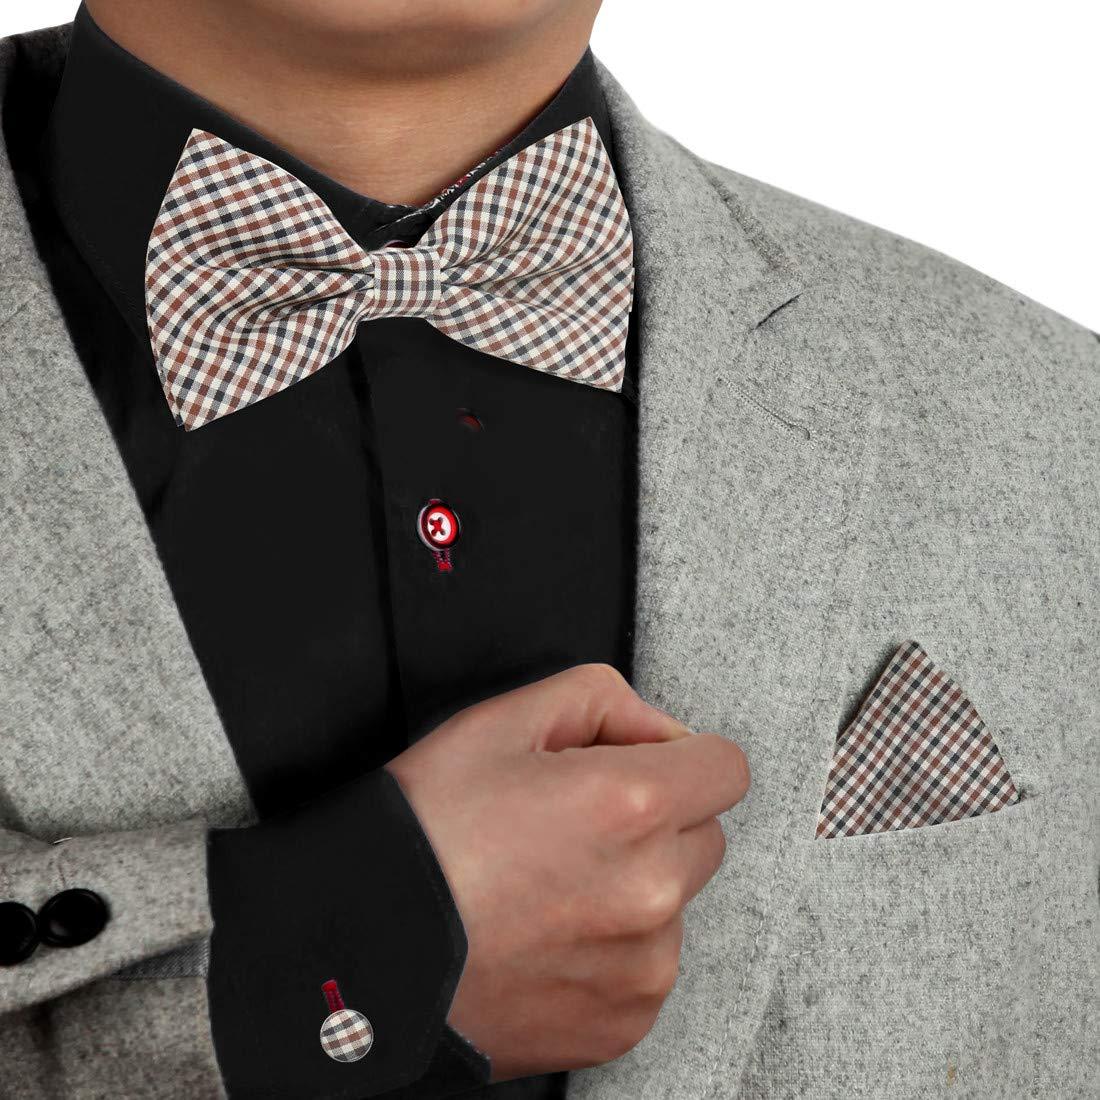 Dan Smith Mens Fashion Muticolors Checkers Microfiber Bow Tie Set With Free Gift Box